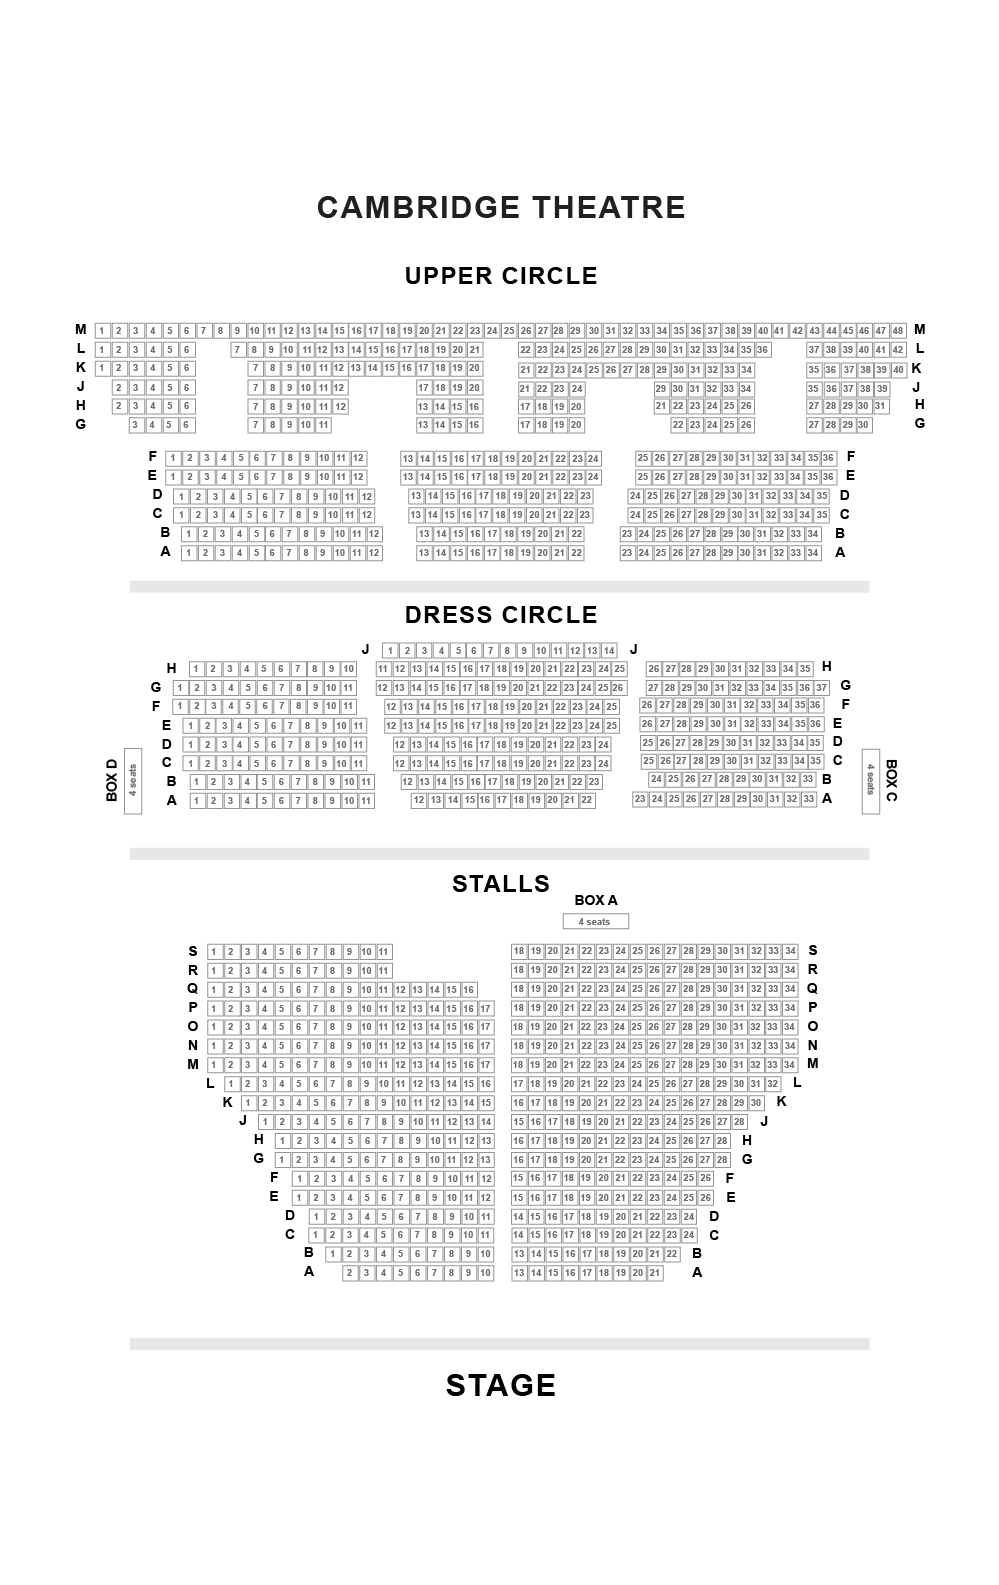 Cambridge Theatre Seating Plan